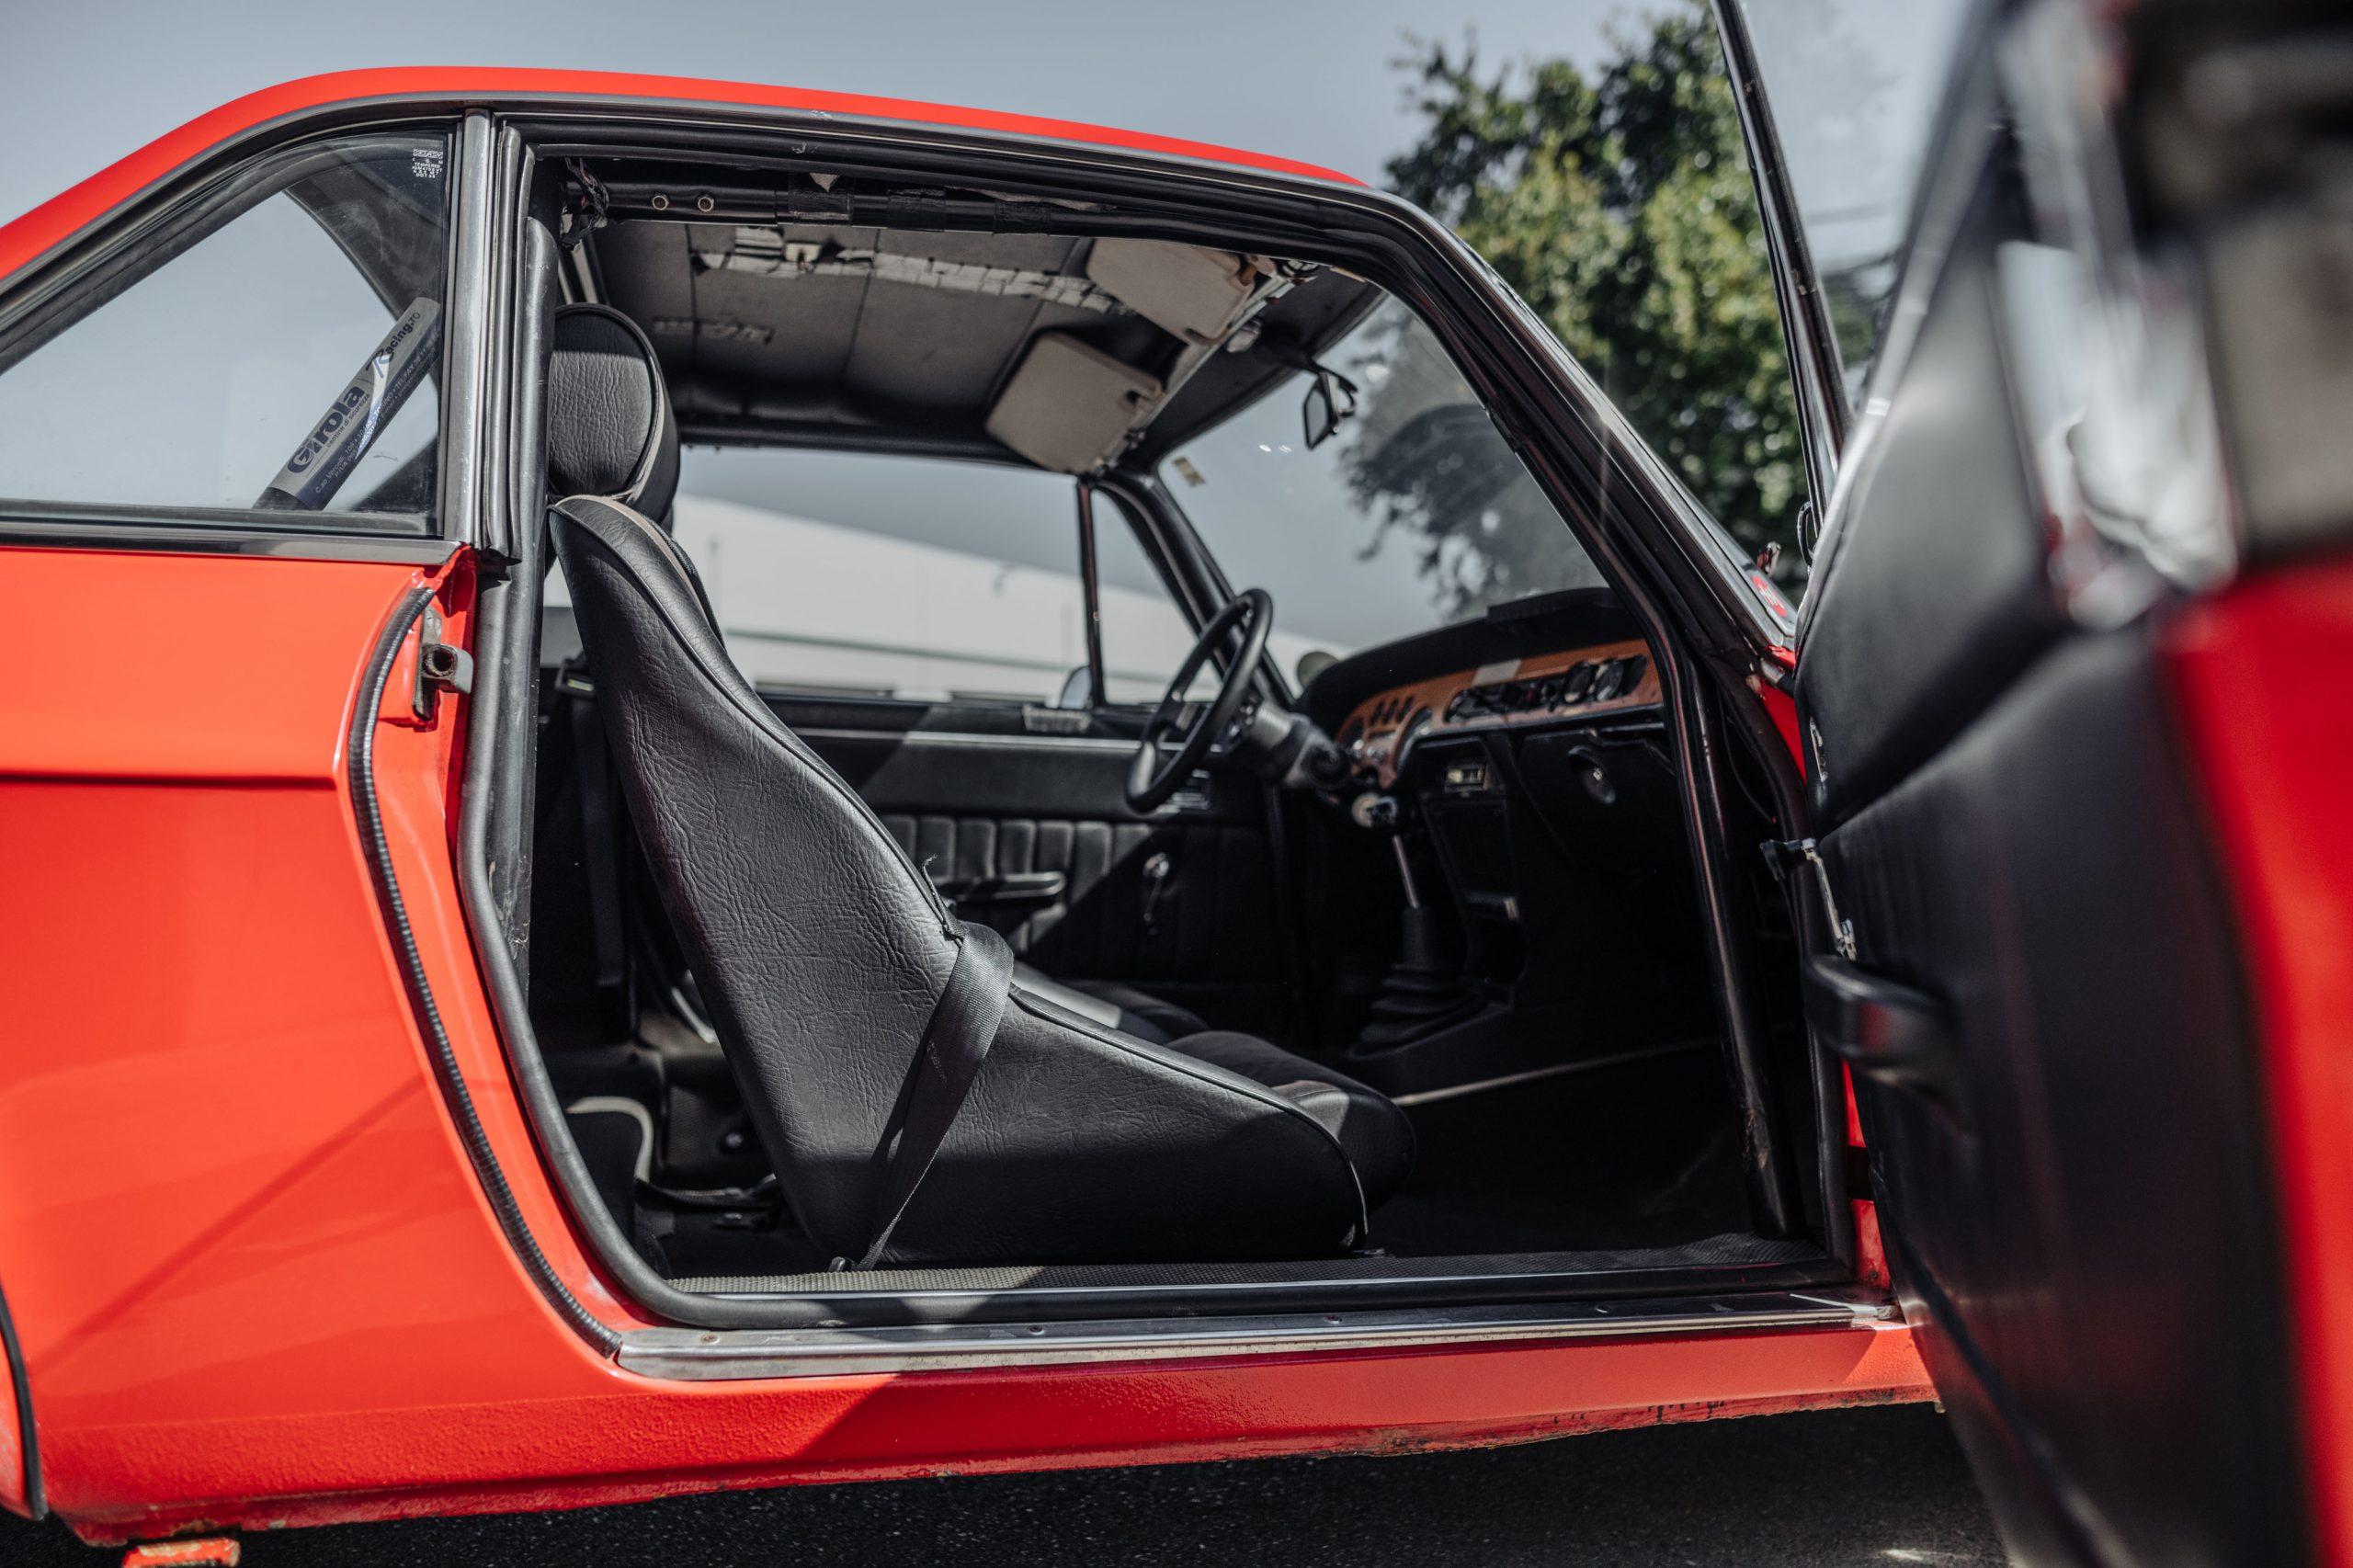 1972 Lancia Fulvia Coupe 1600 HF Series 2 Fanalino door open interior